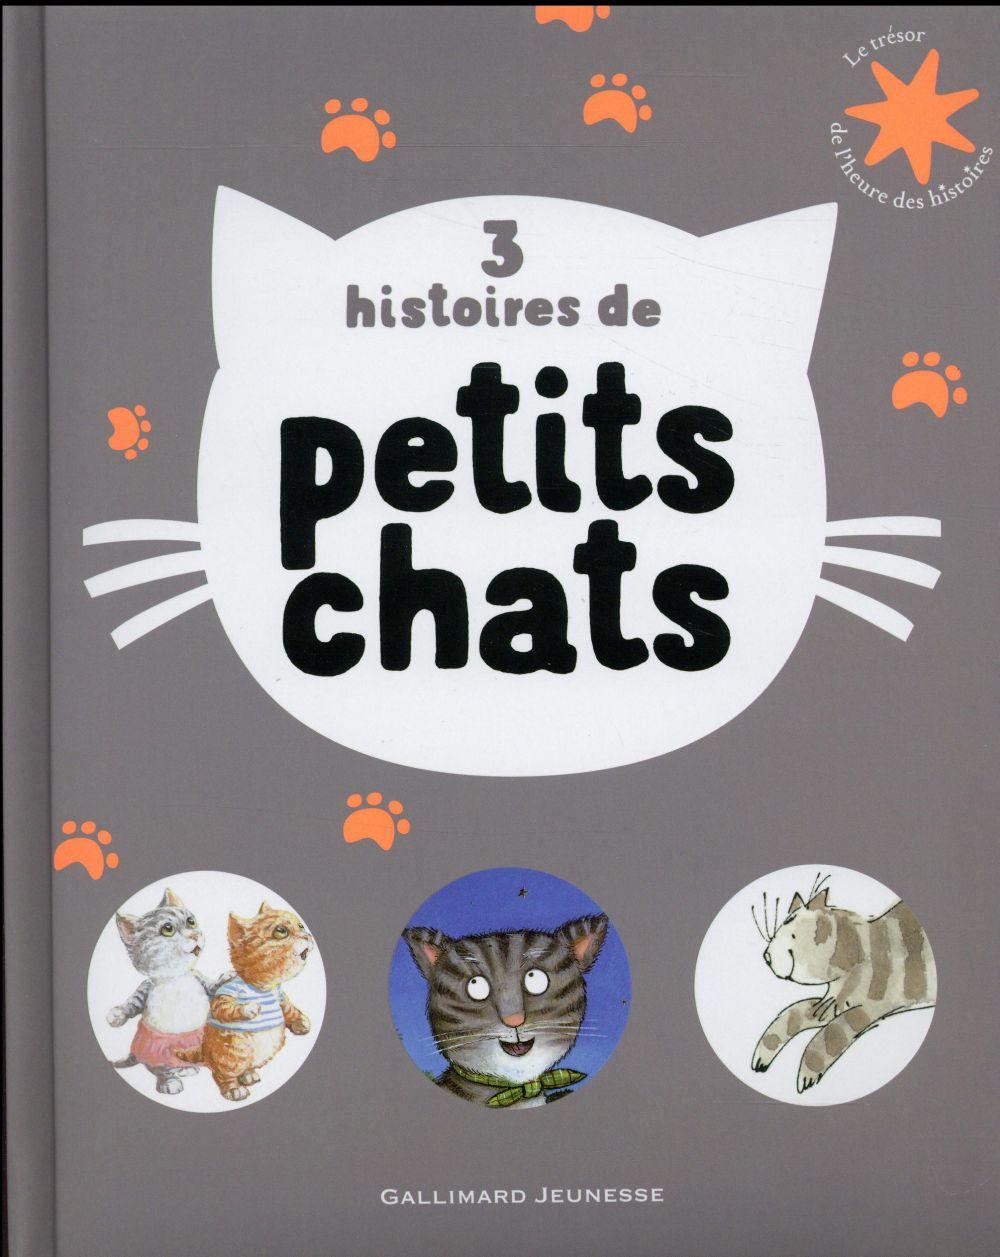 3 HISTOIRES DE PETITS CHATS COLLECTIF/KRINGS Gallimard-Jeunesse